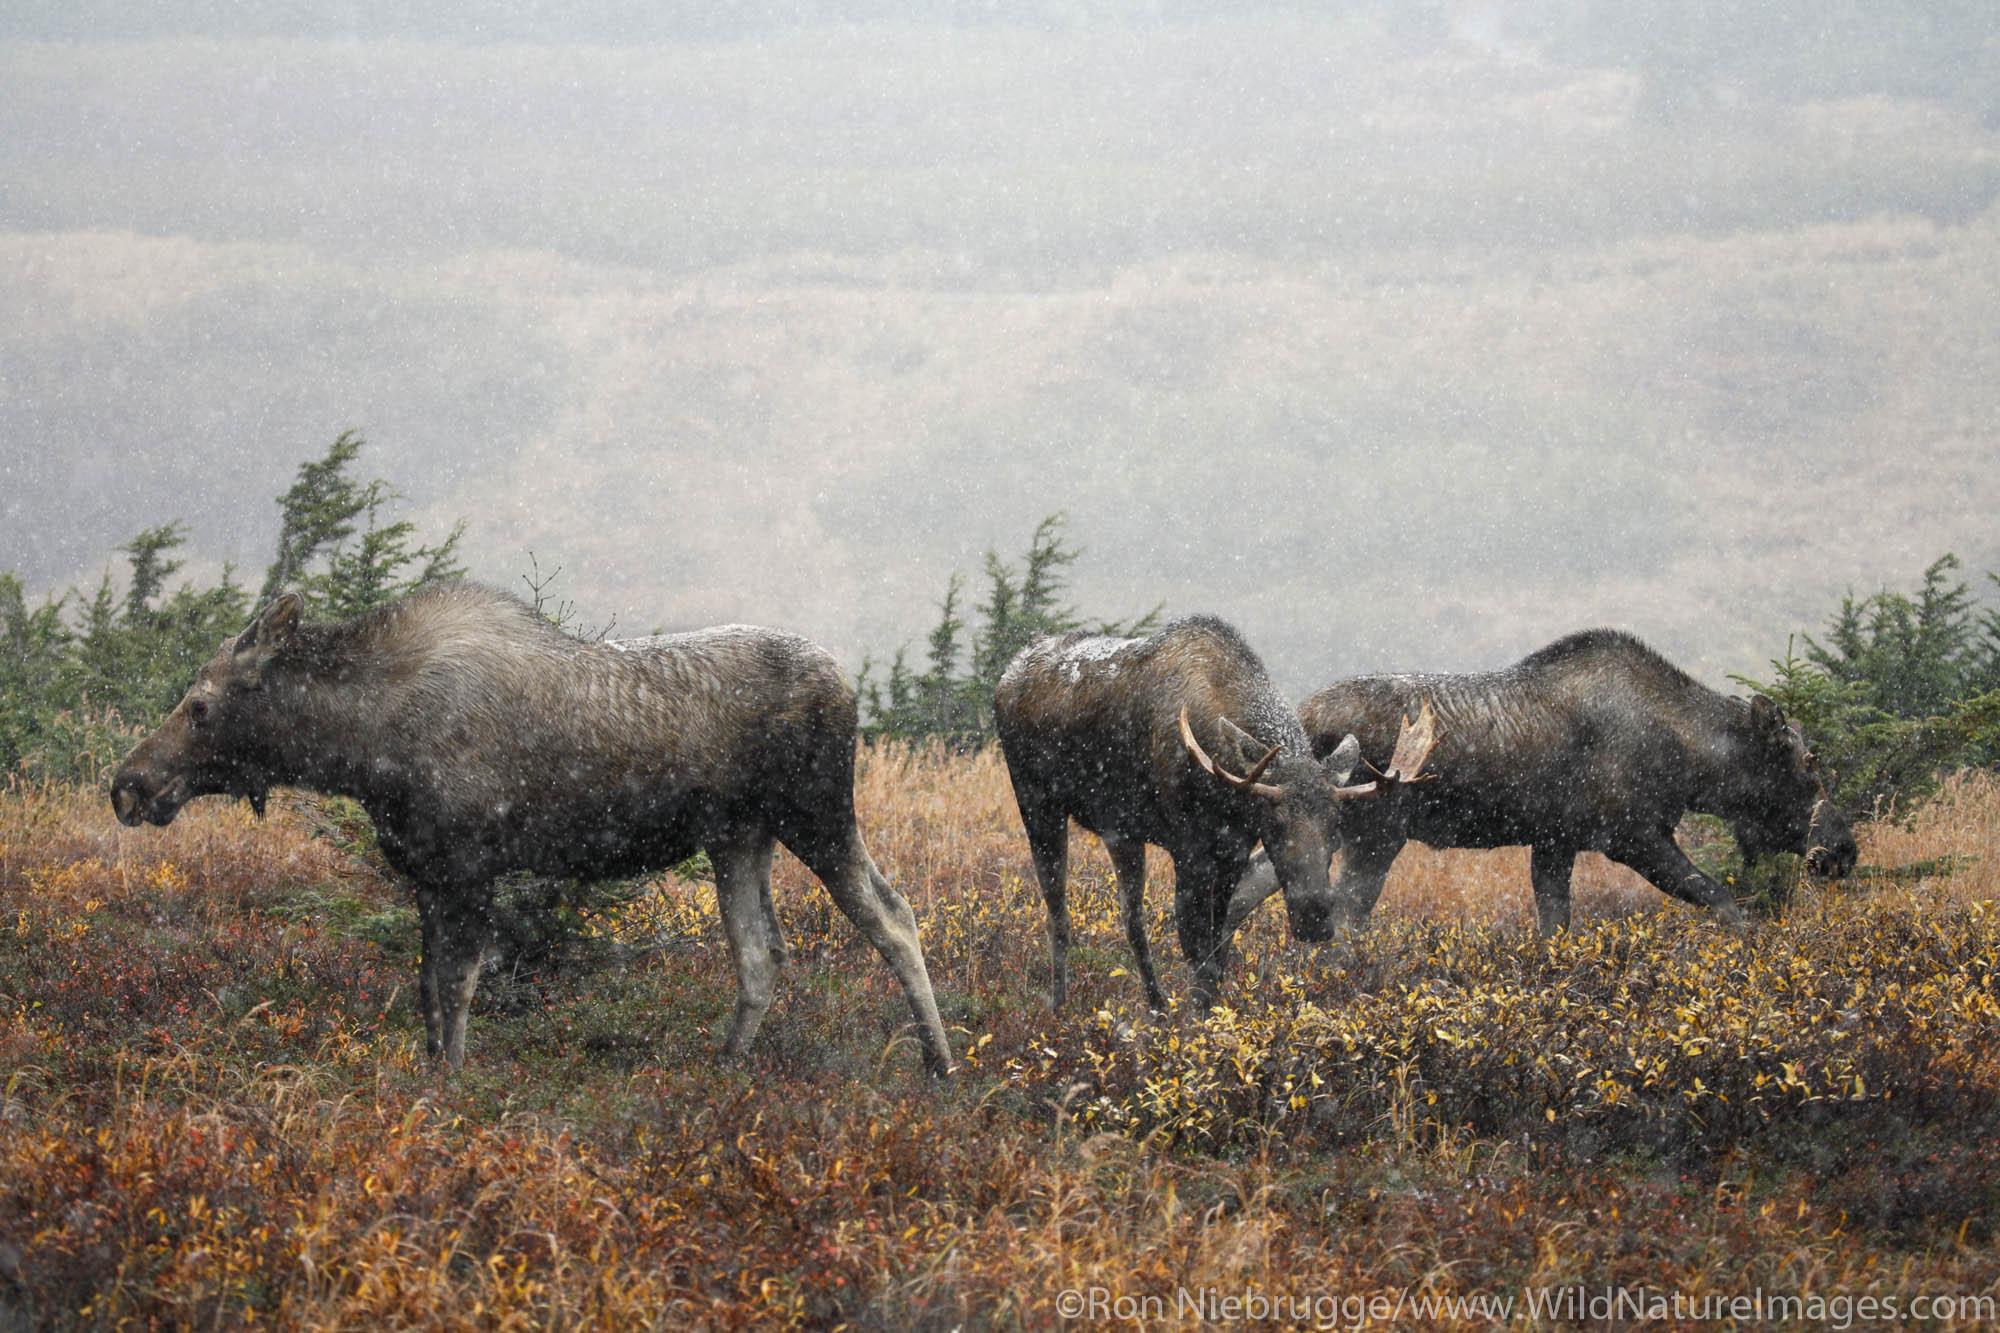 Bull Moose with his harem during Fall rut in Chugach Mountains, Chugach State Park, Alaska.